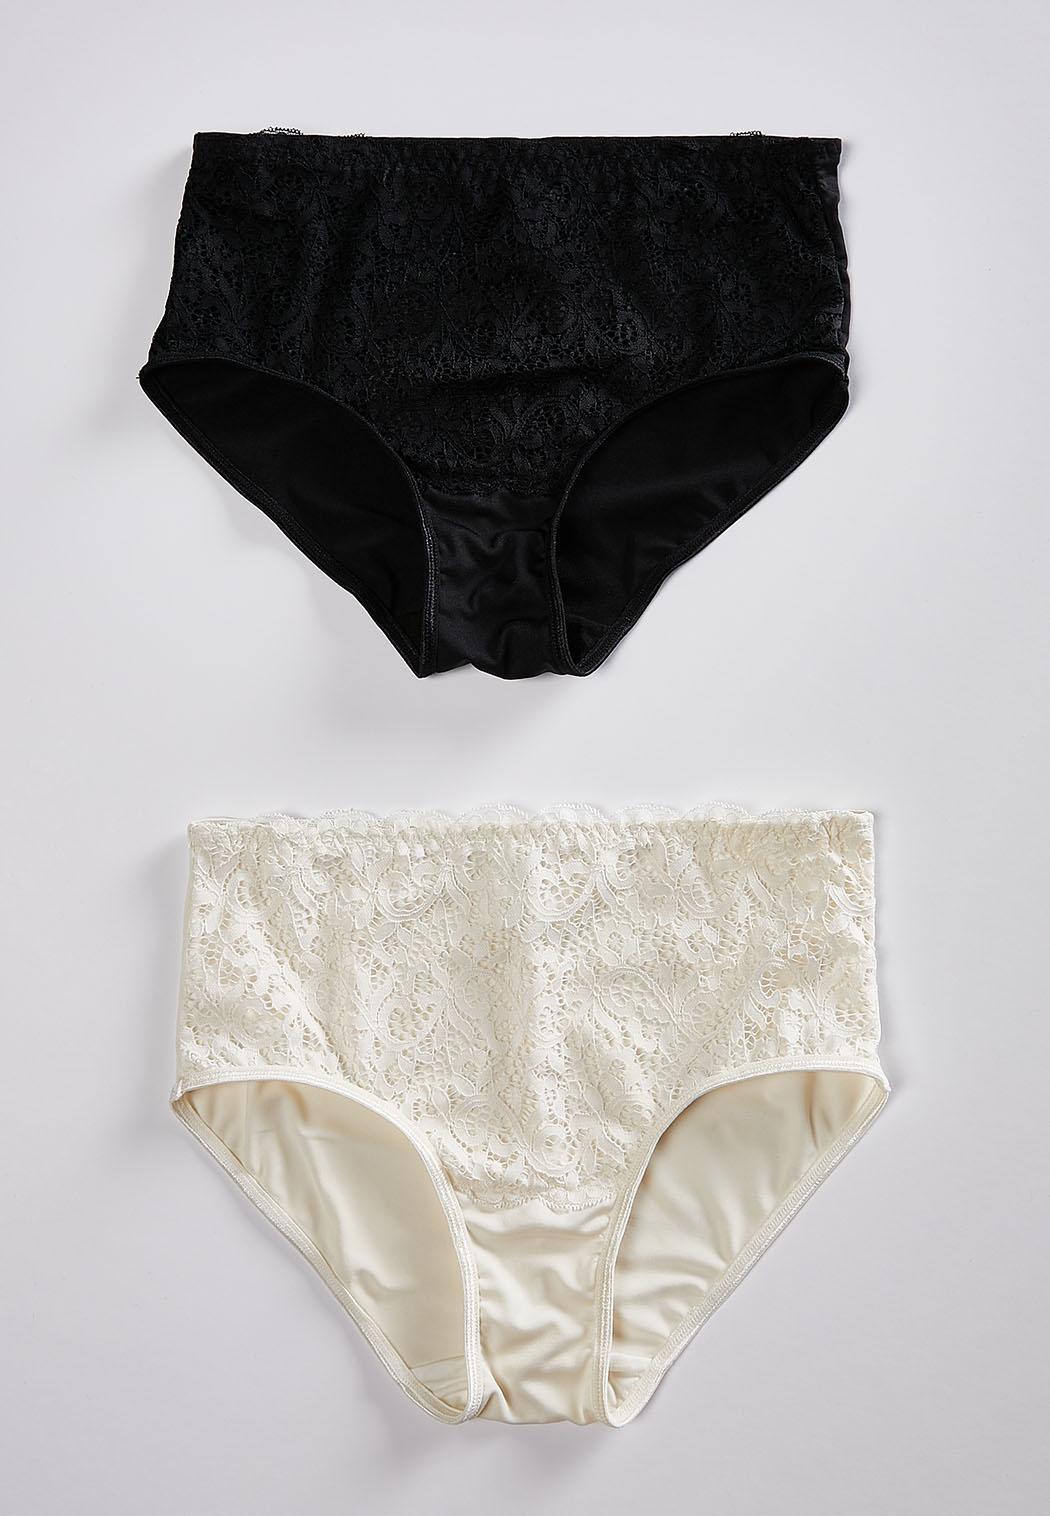 4cb42d9046 High Waist Lace Panty Set Panties Cato Fashions